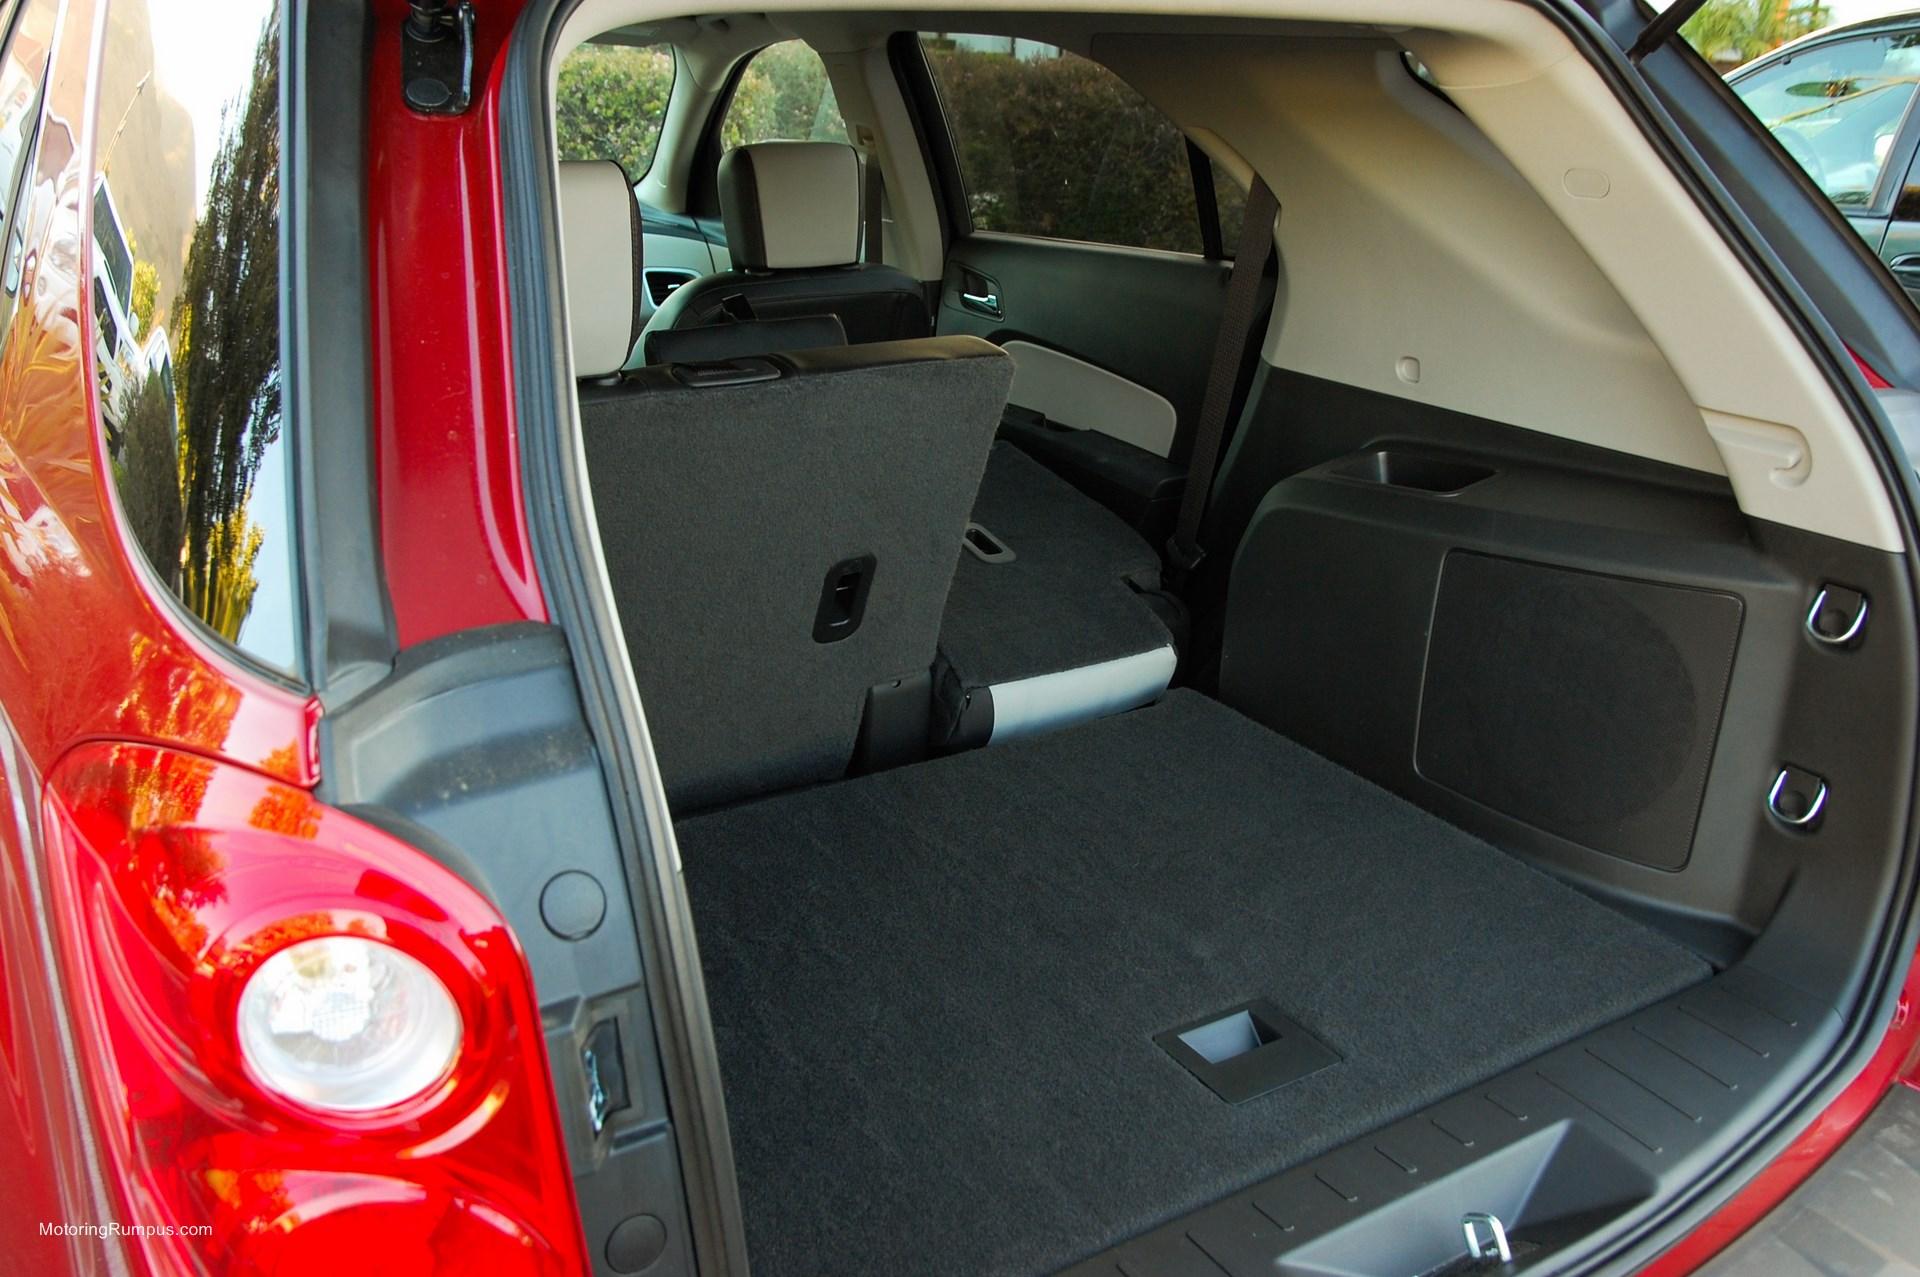 2014 Chevy Equinox Review Motoring Rumpus